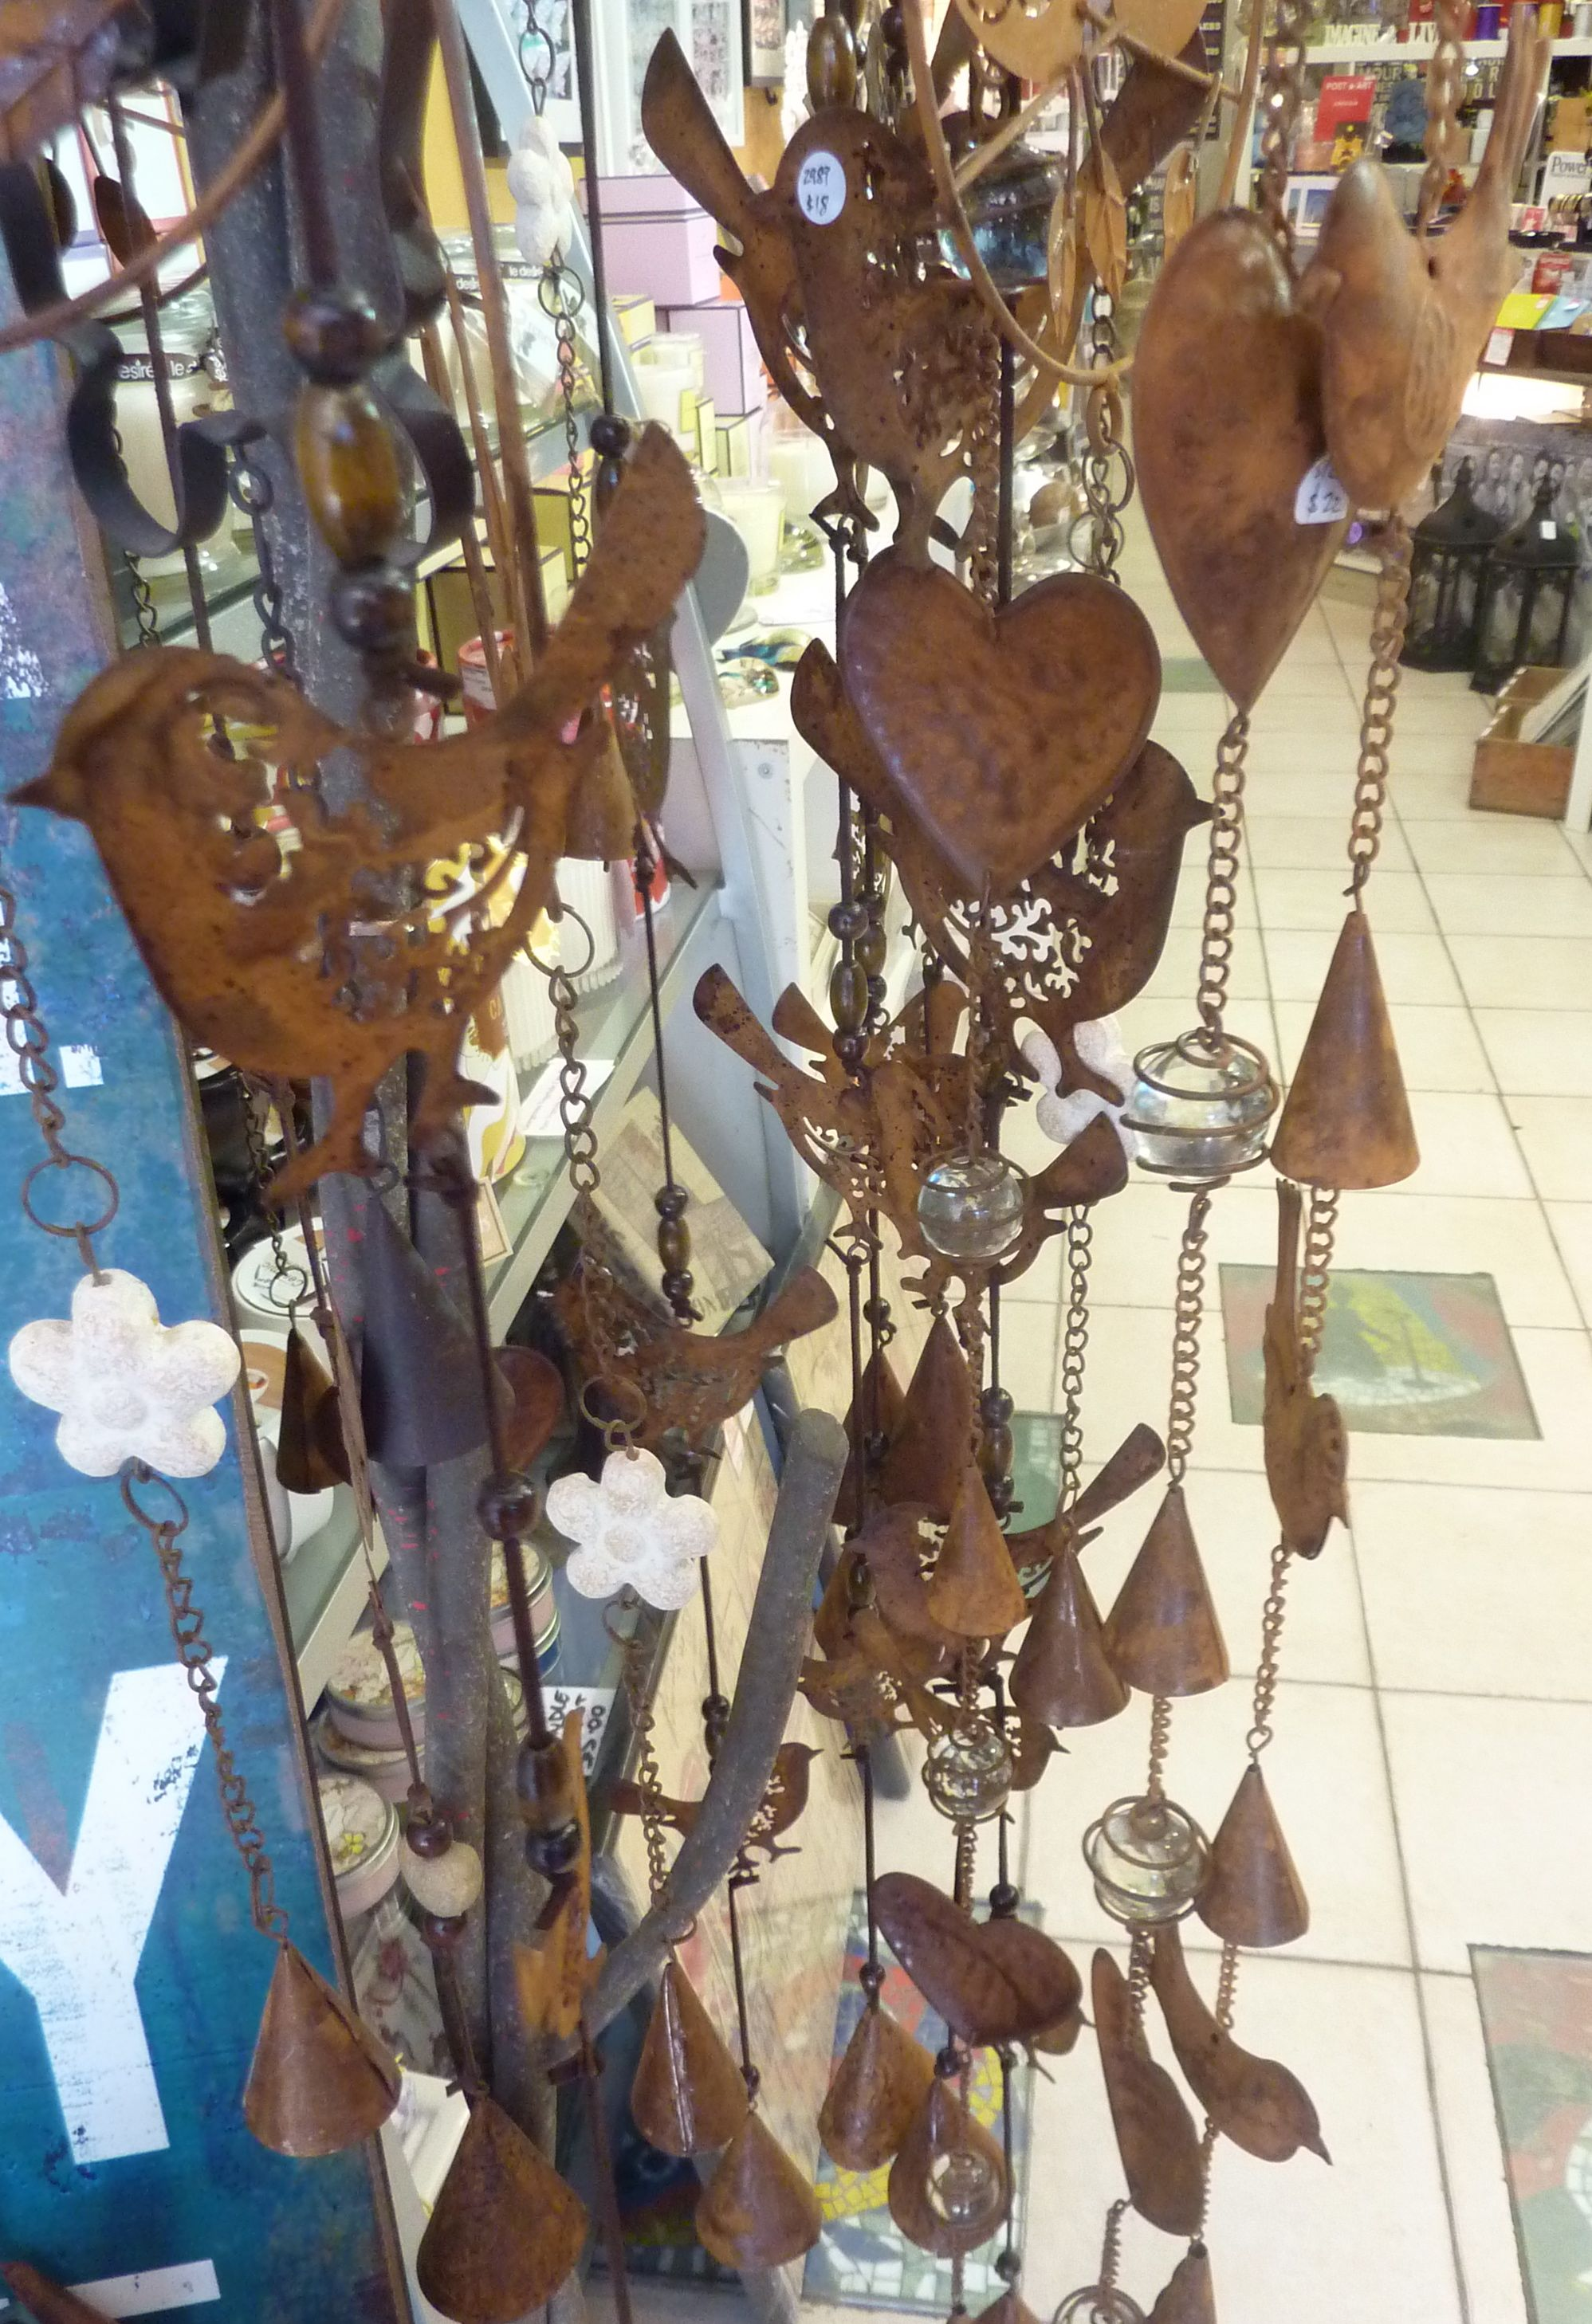 Hanging rust chimes - $18